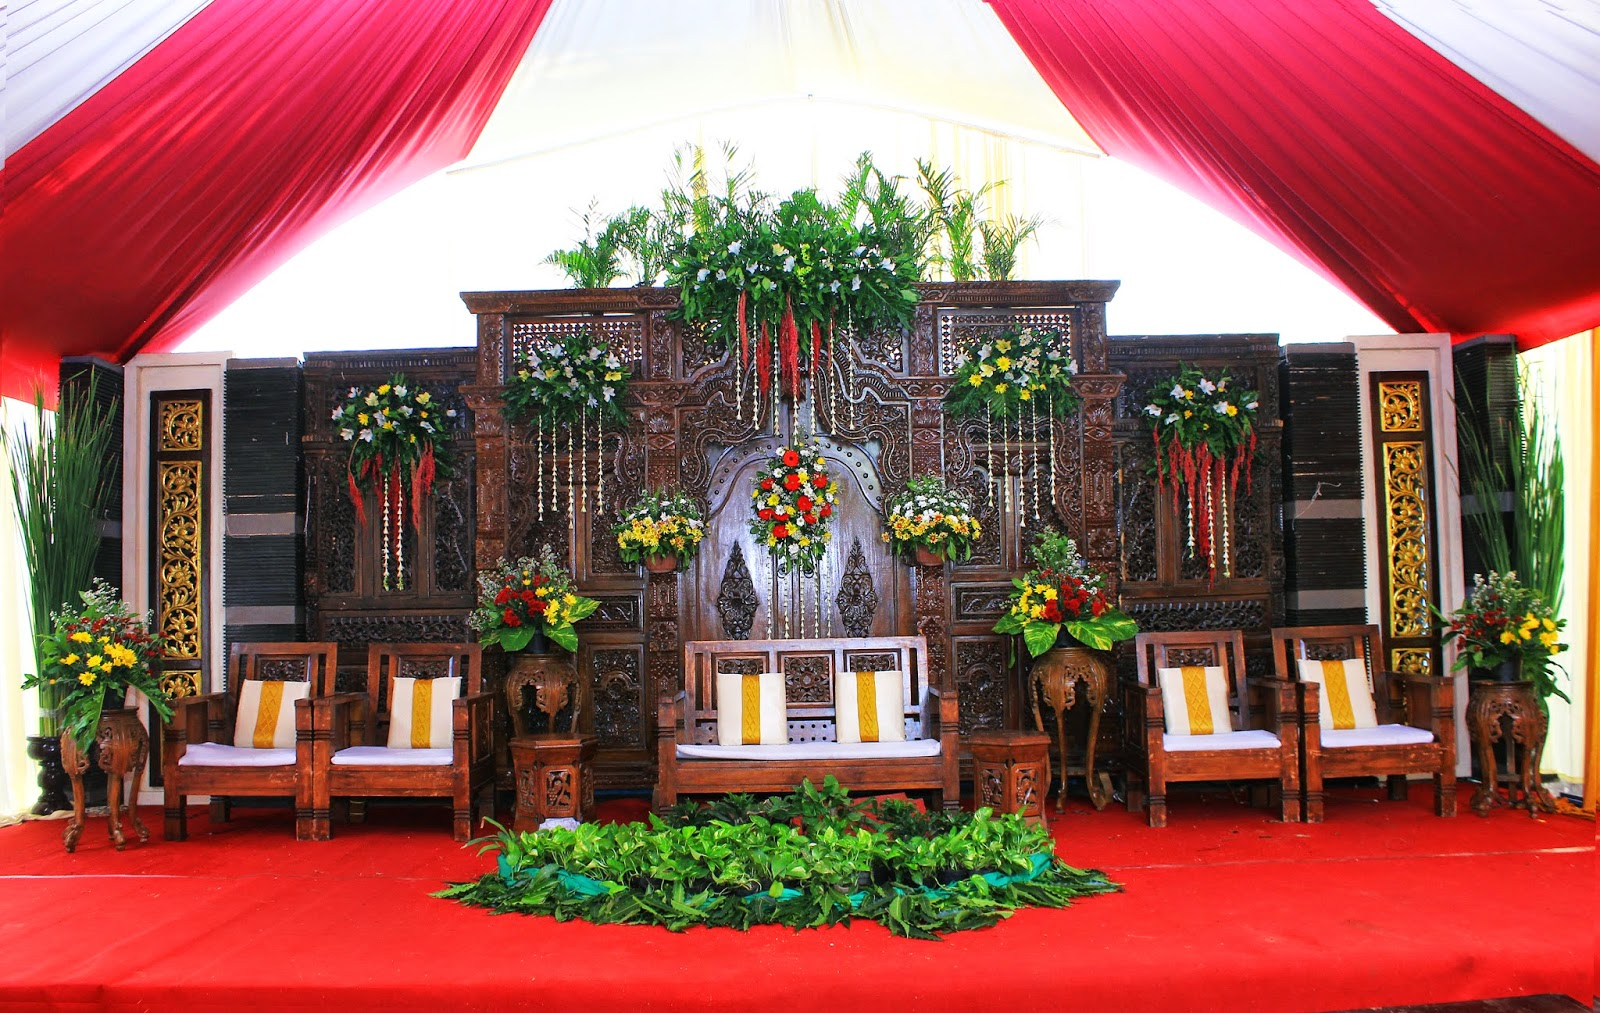 prisma organizer event wedding organizer 2015 rh prismaorganizer blogspot com